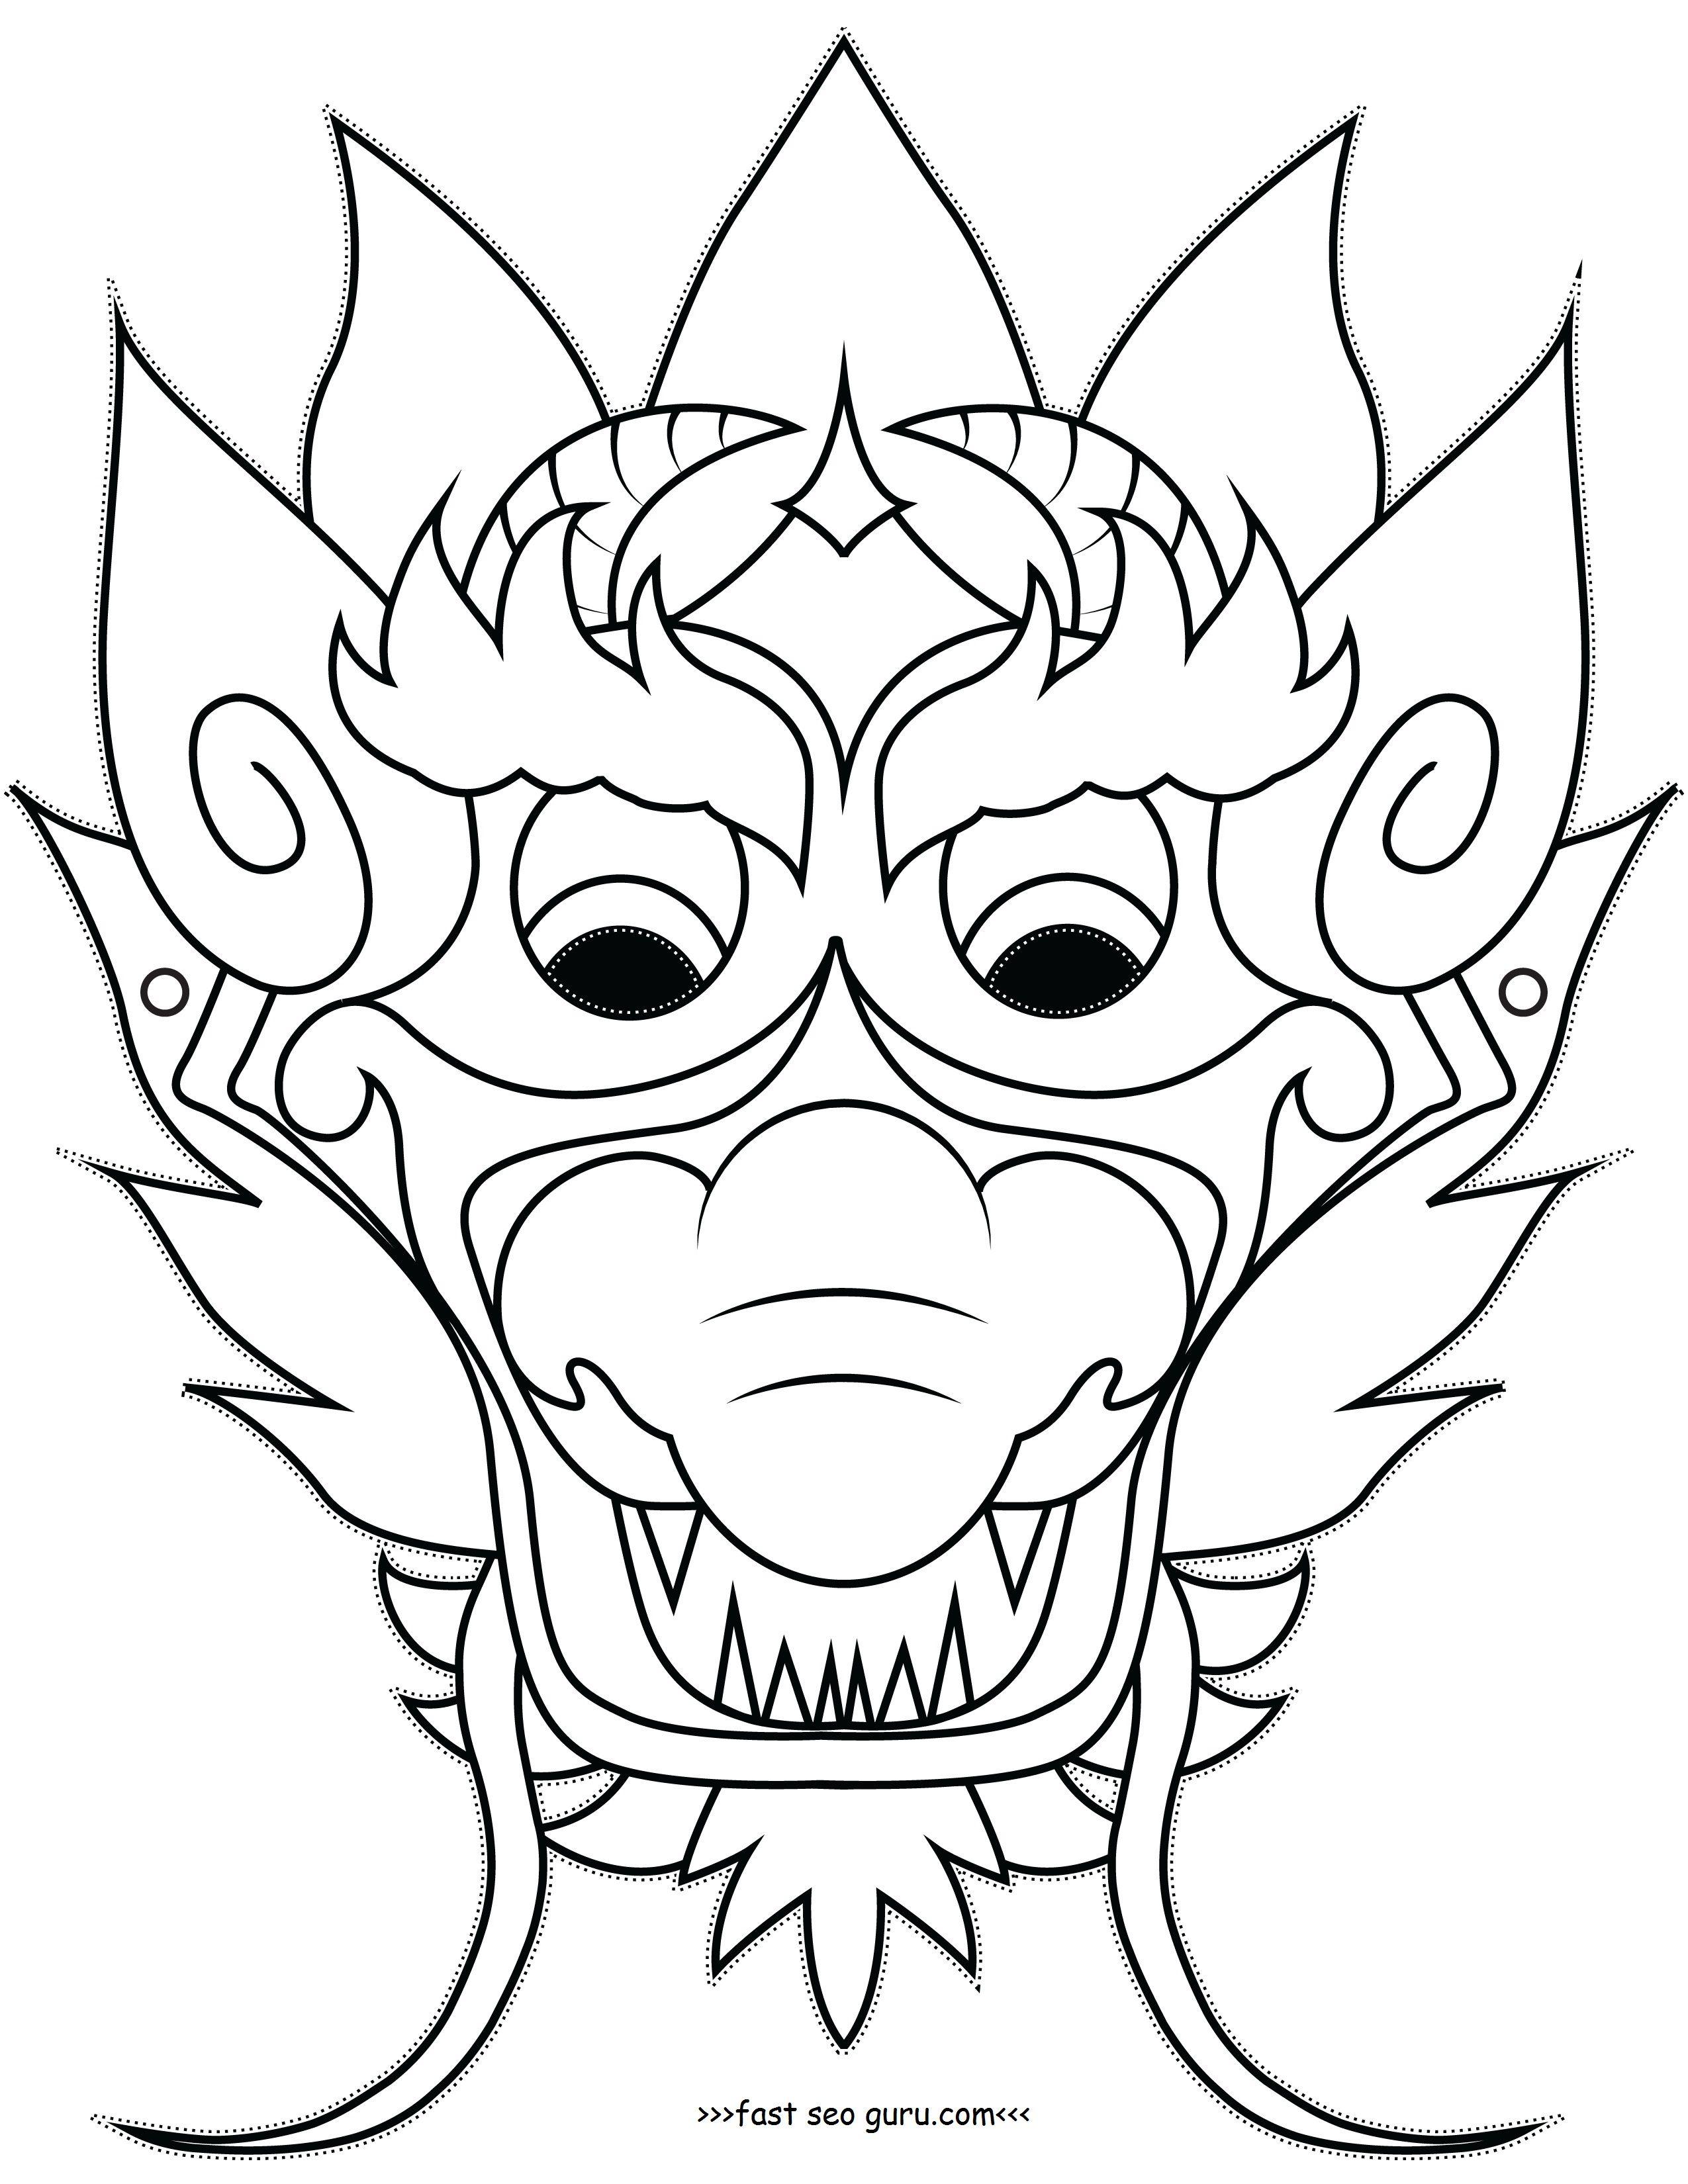 Free blank masks coloring pages | masks | Pinterest | Blank mask ...